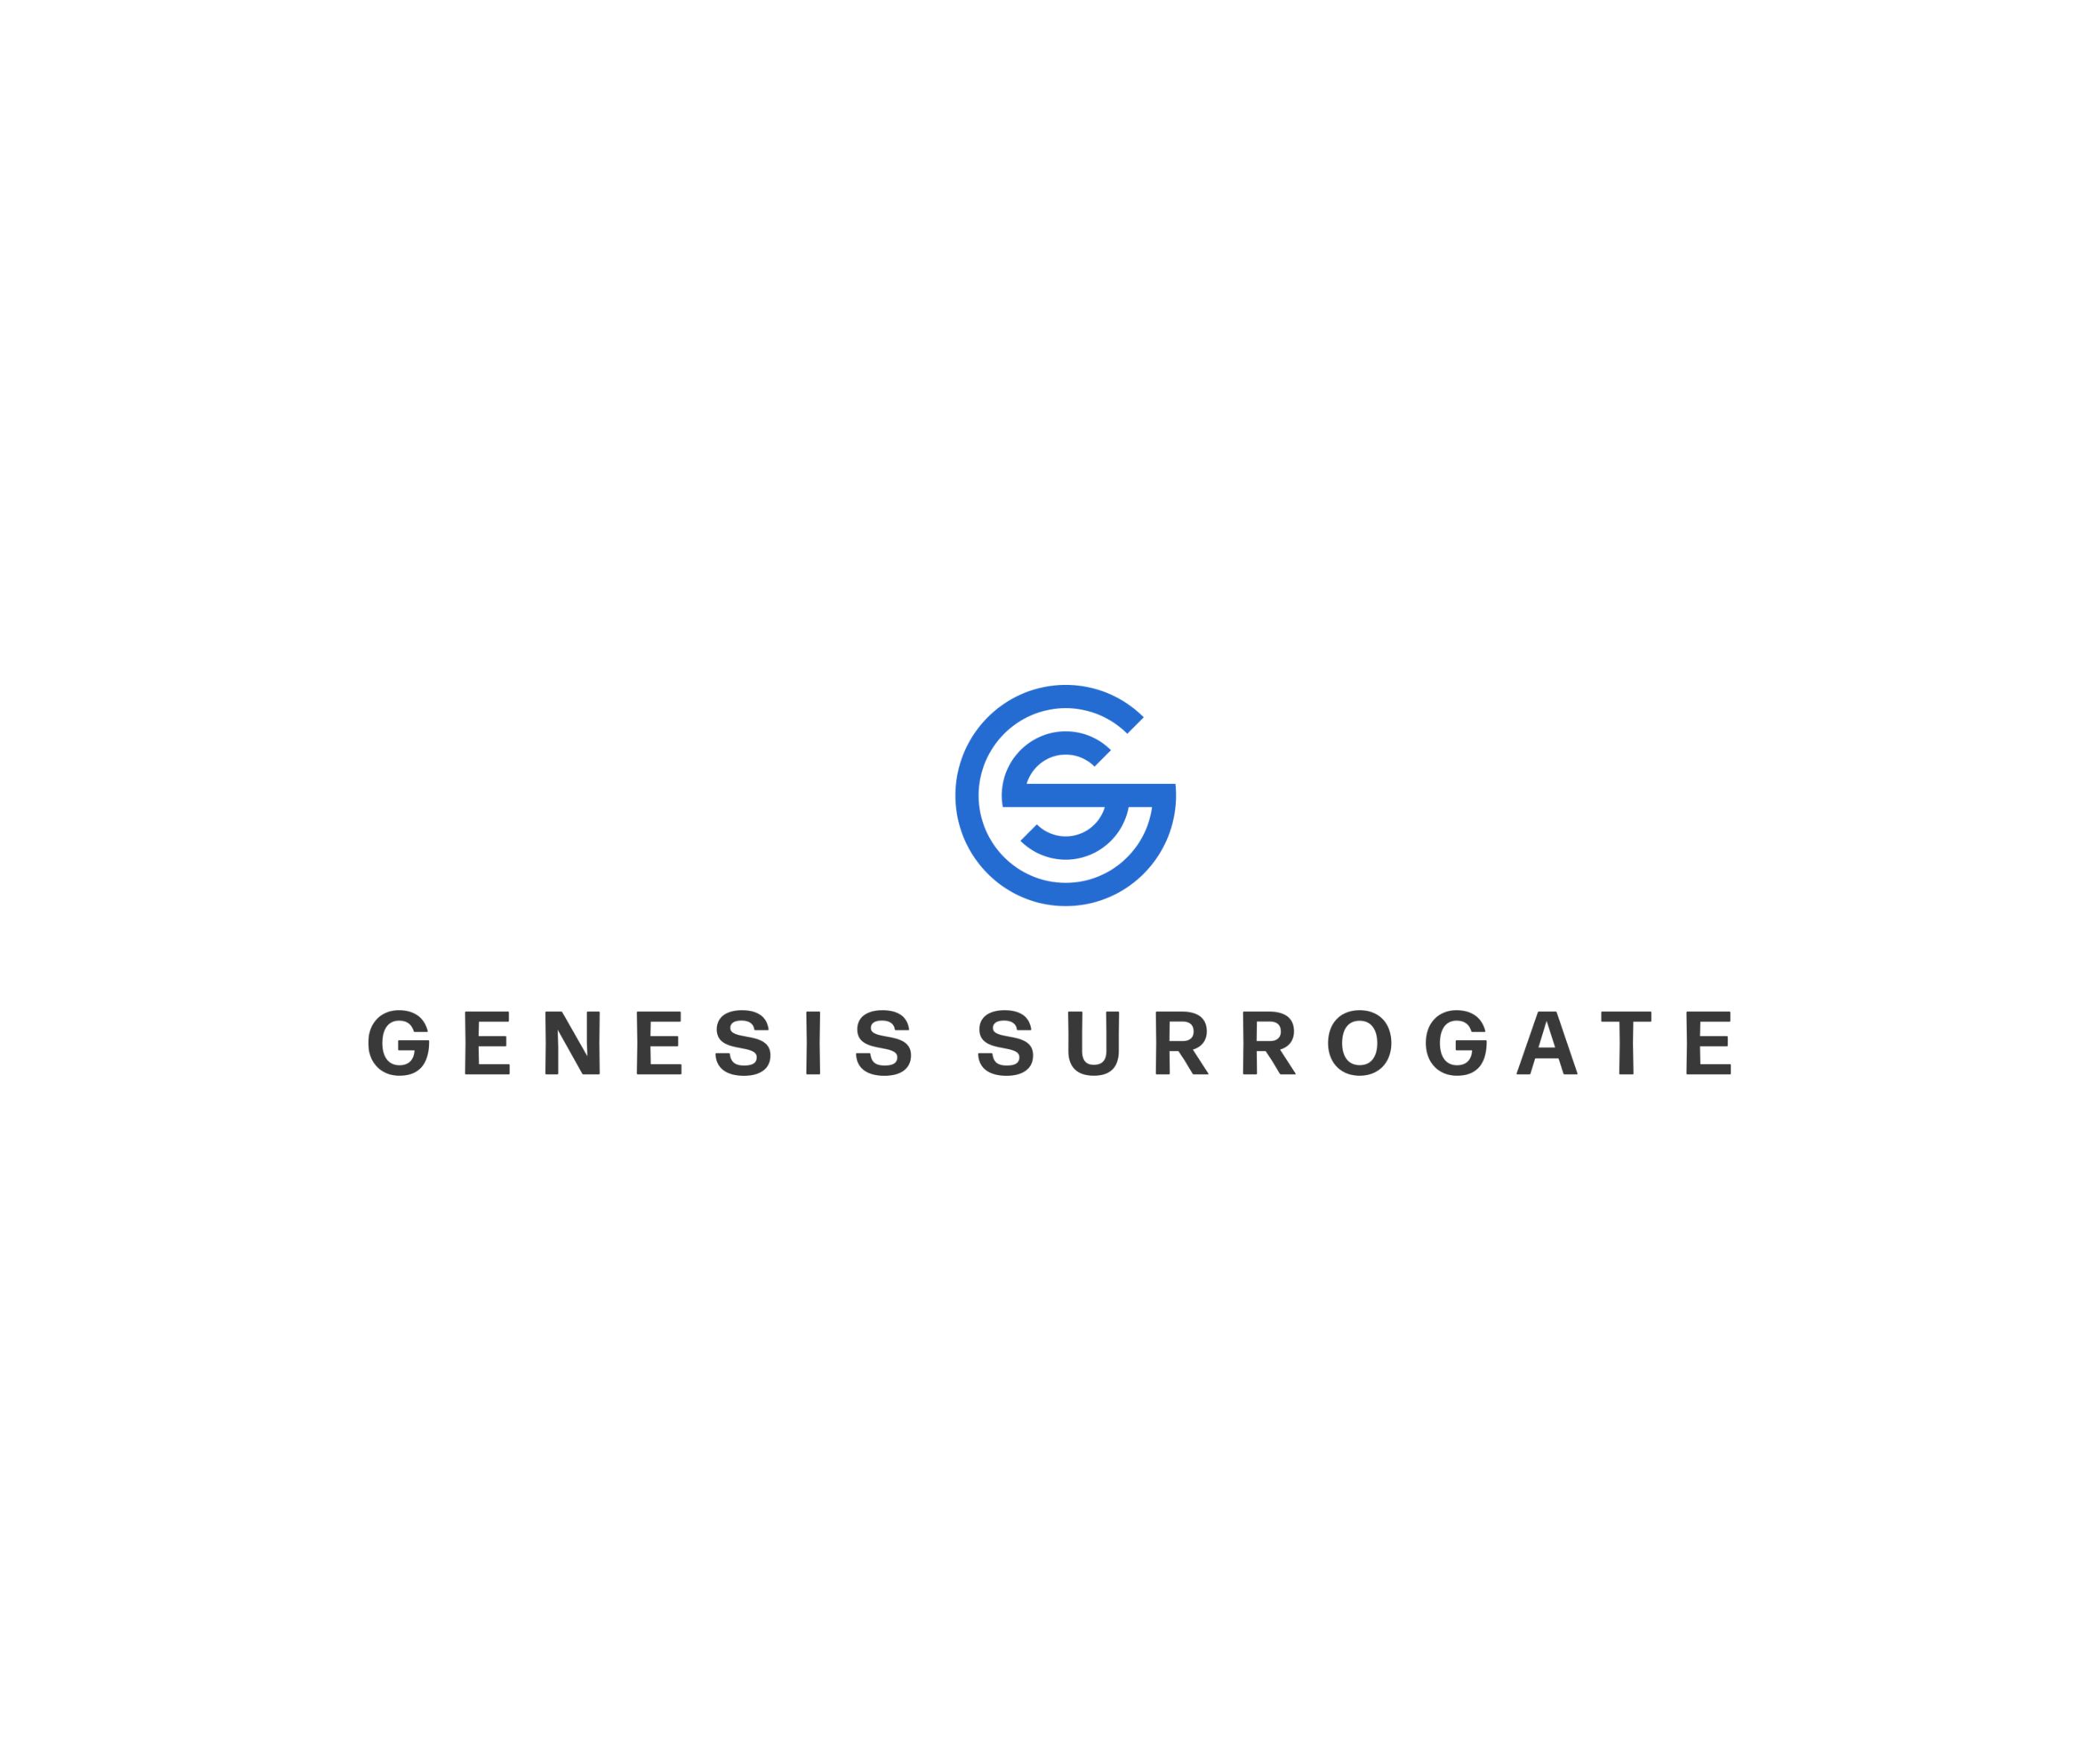 Genesis Surrogate Logo (1)